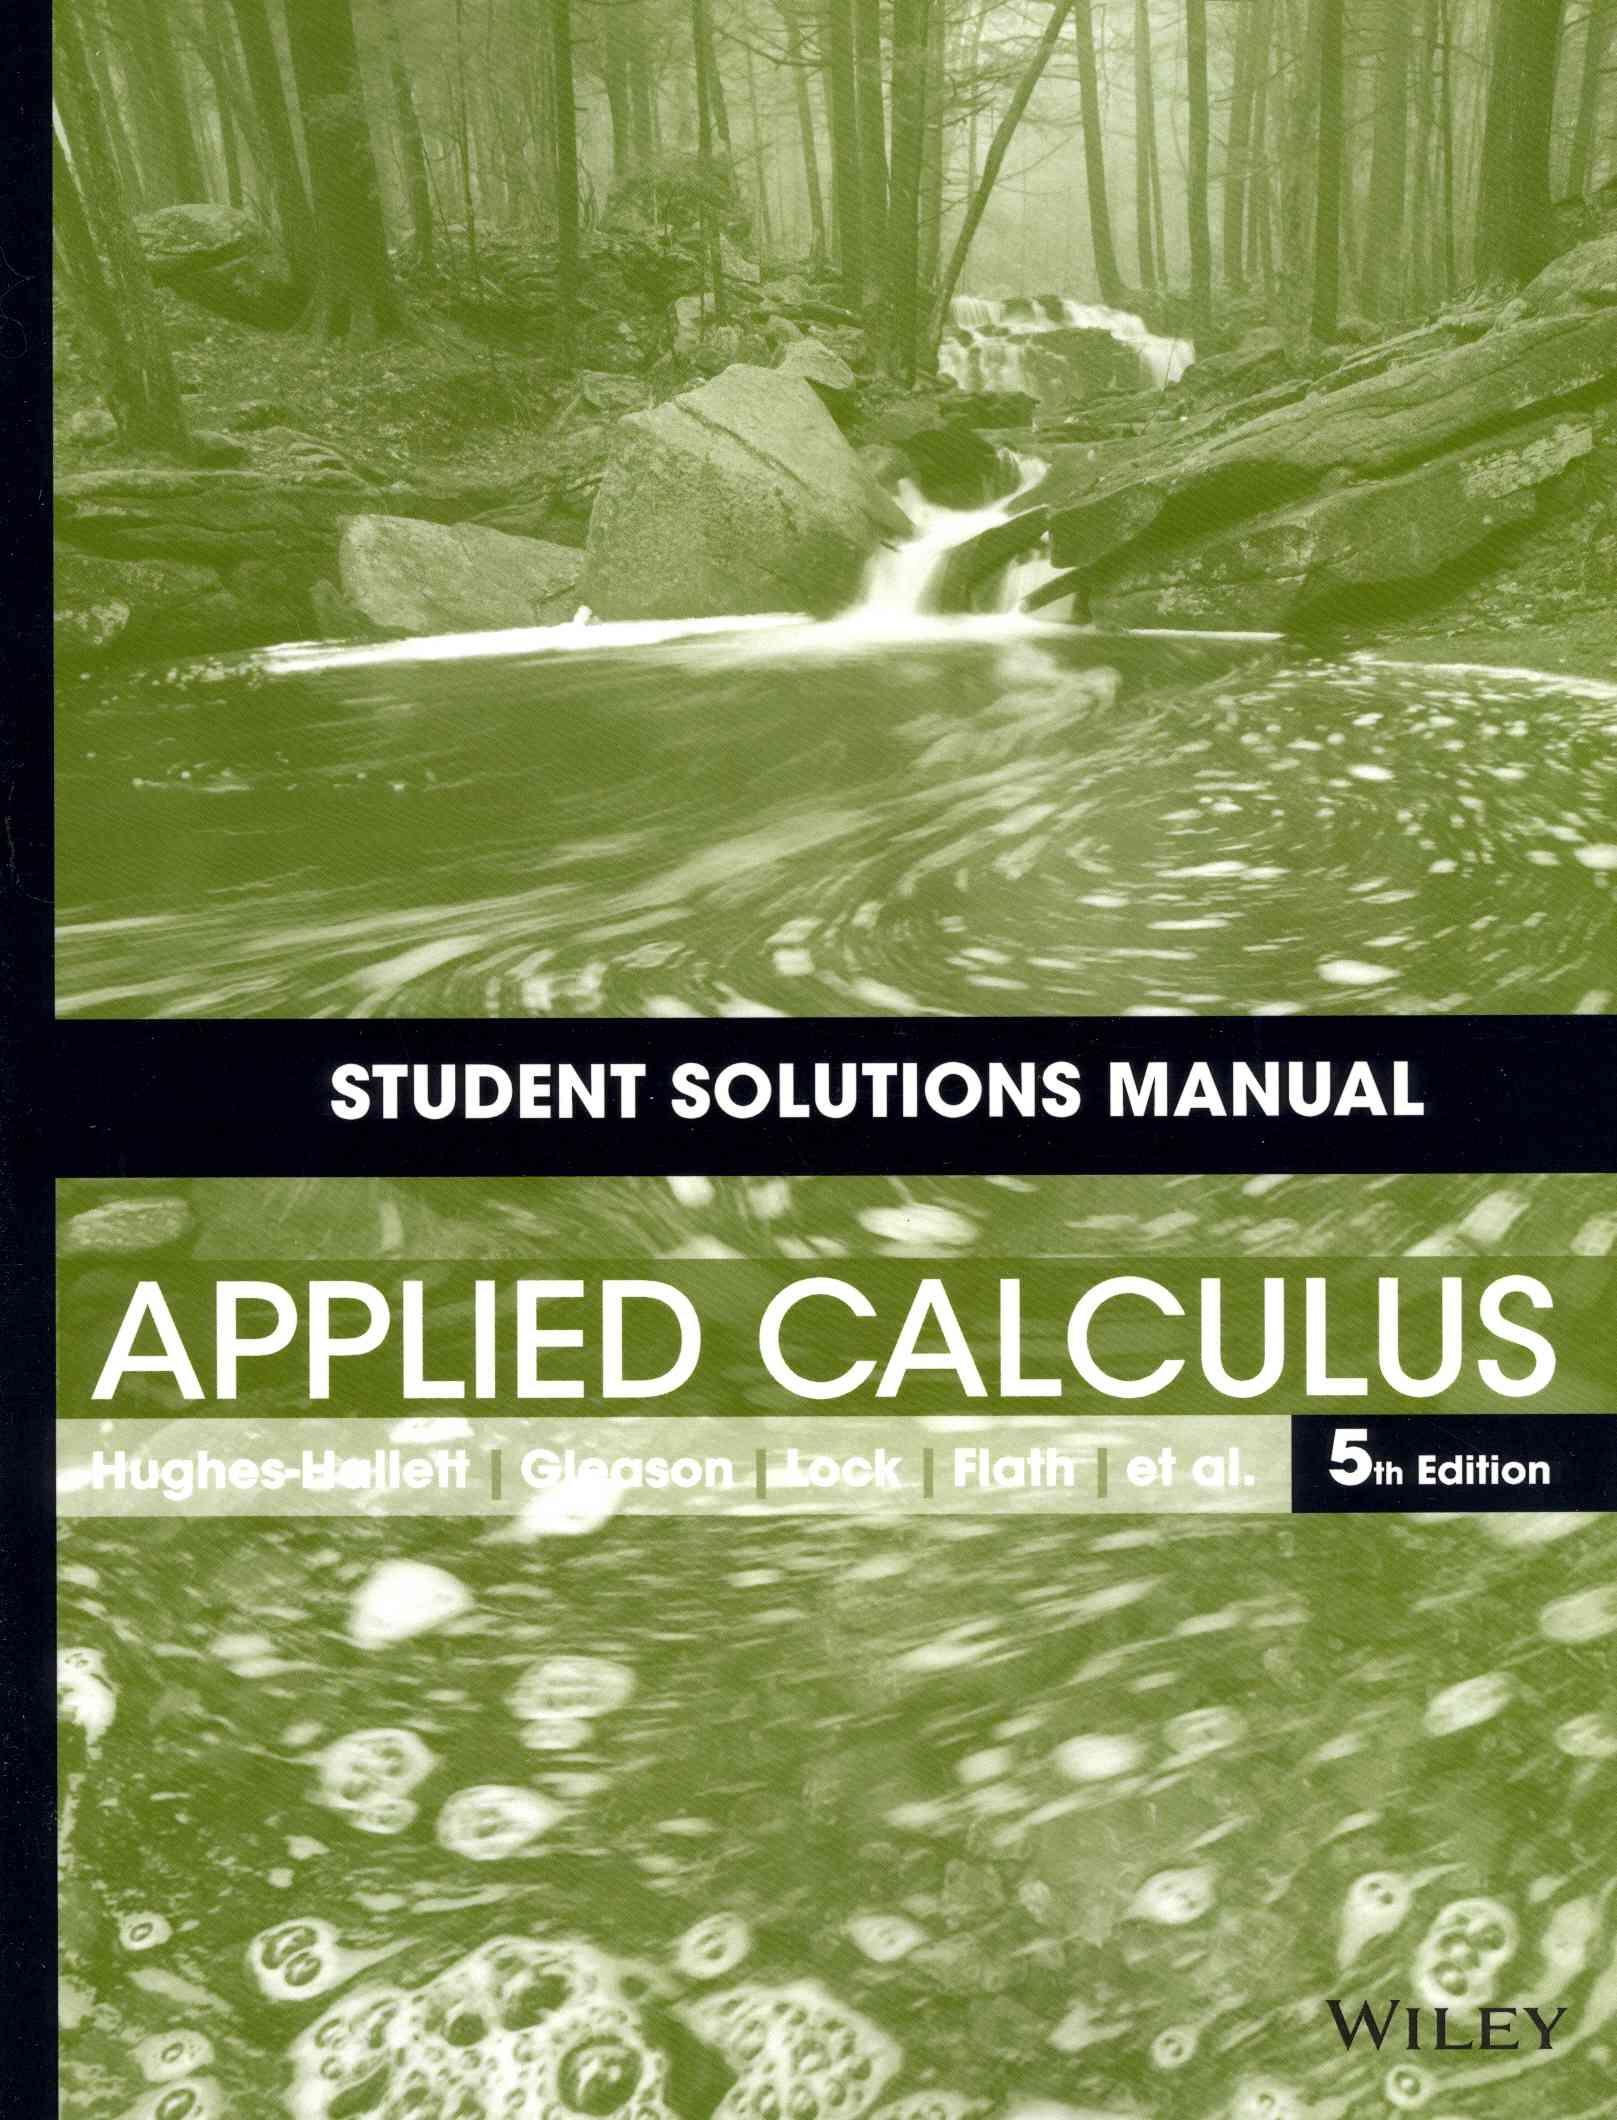 Applied Calculus By Hughes-Hallett, Deborah/ Lock, Patti Frazer/ Gleason, Andrew M./ Flath, Daniel E./ Gordon, Sheldon P.